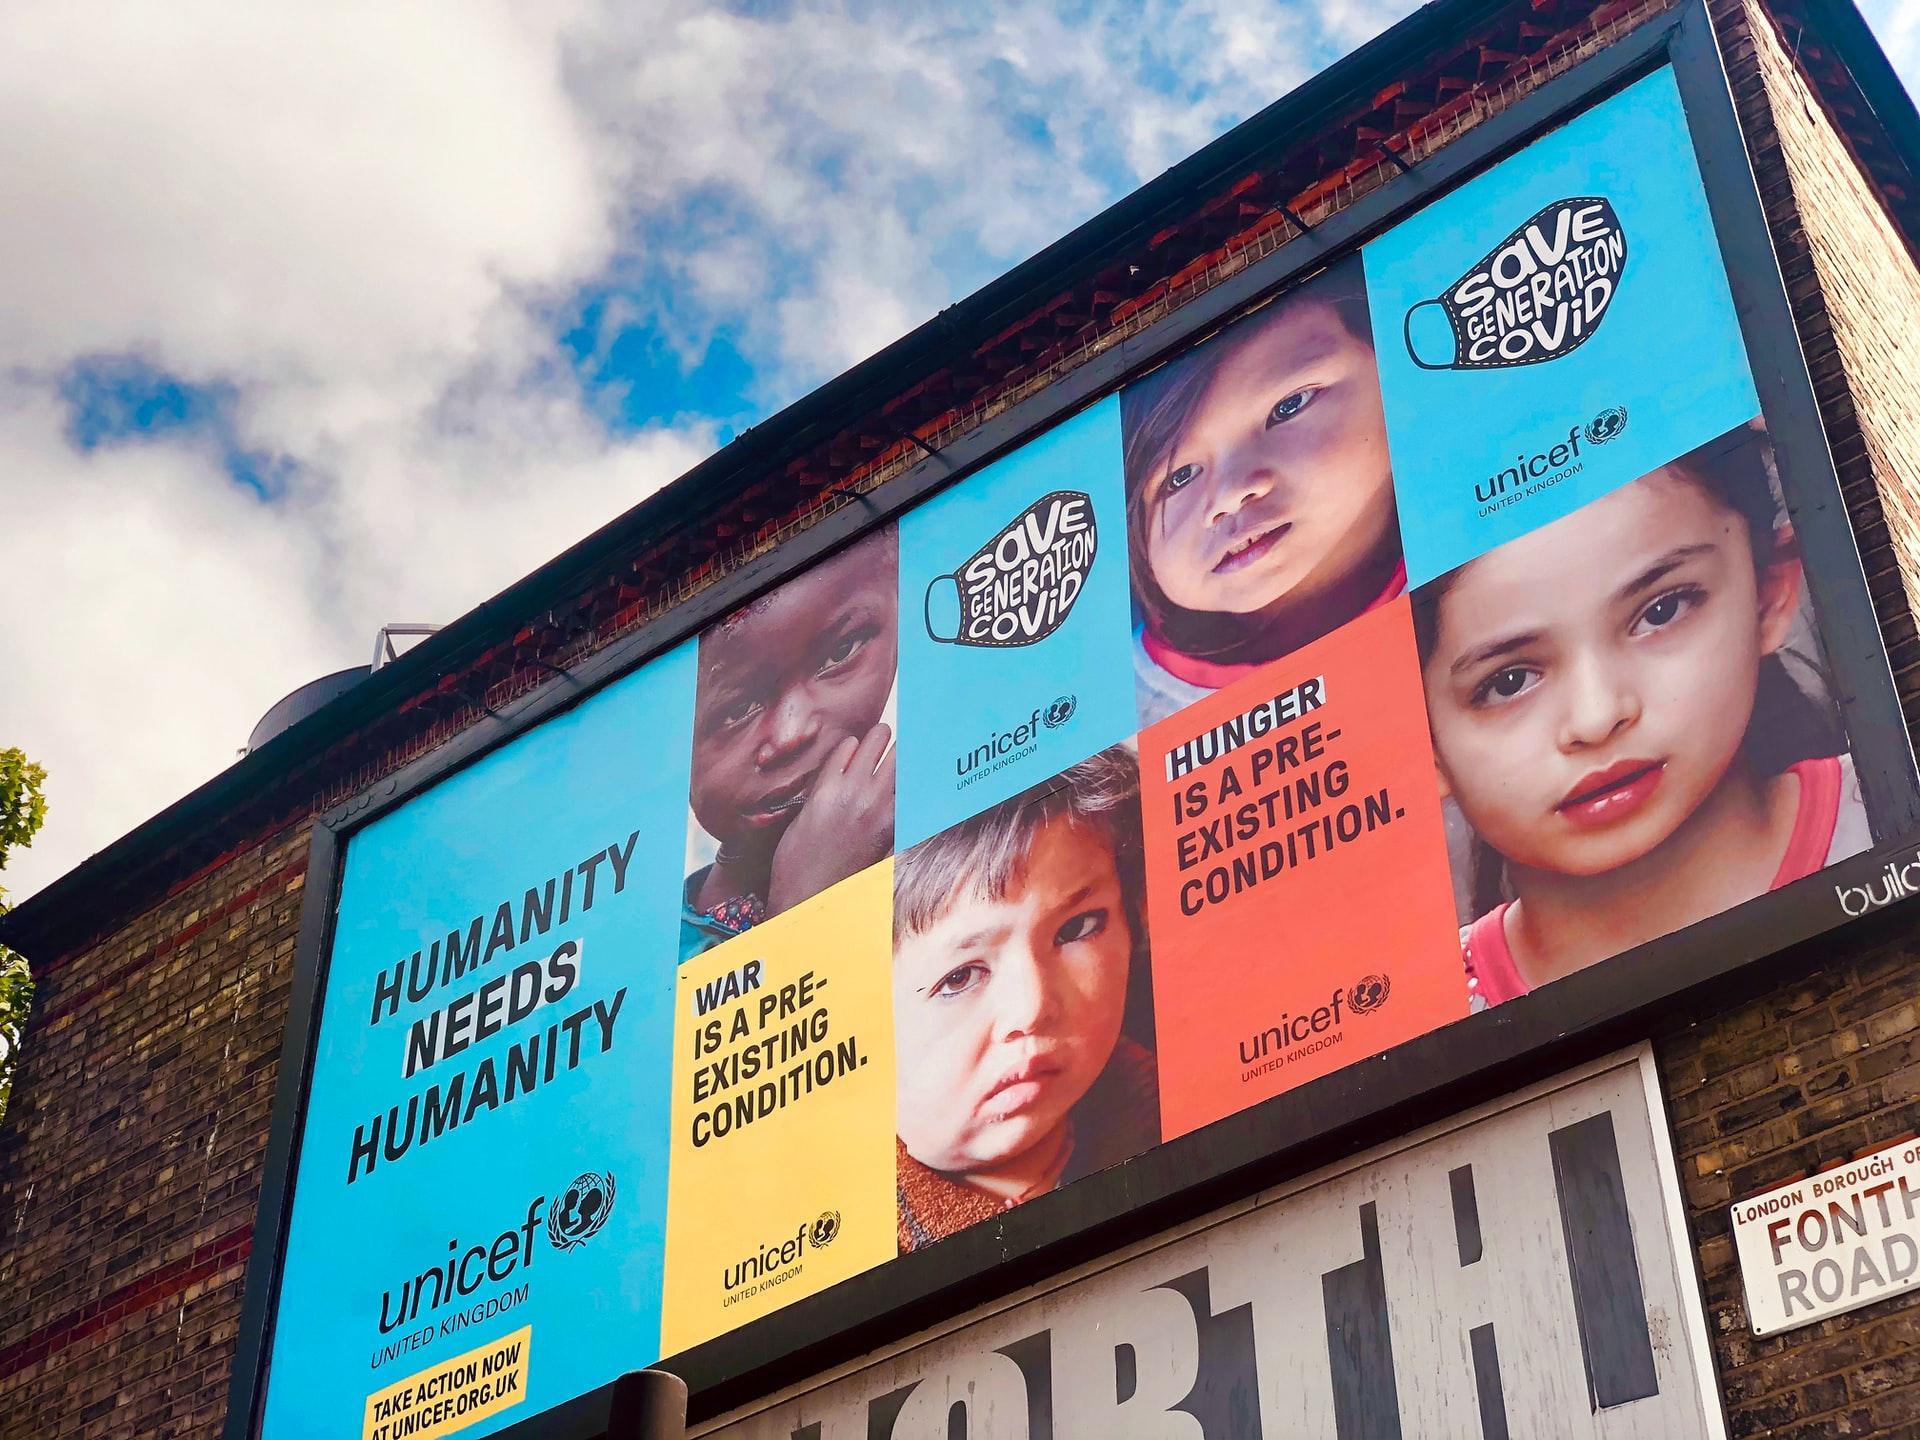 etienne godiard ShDX3myL4j4 unsplash - Die UNICEF